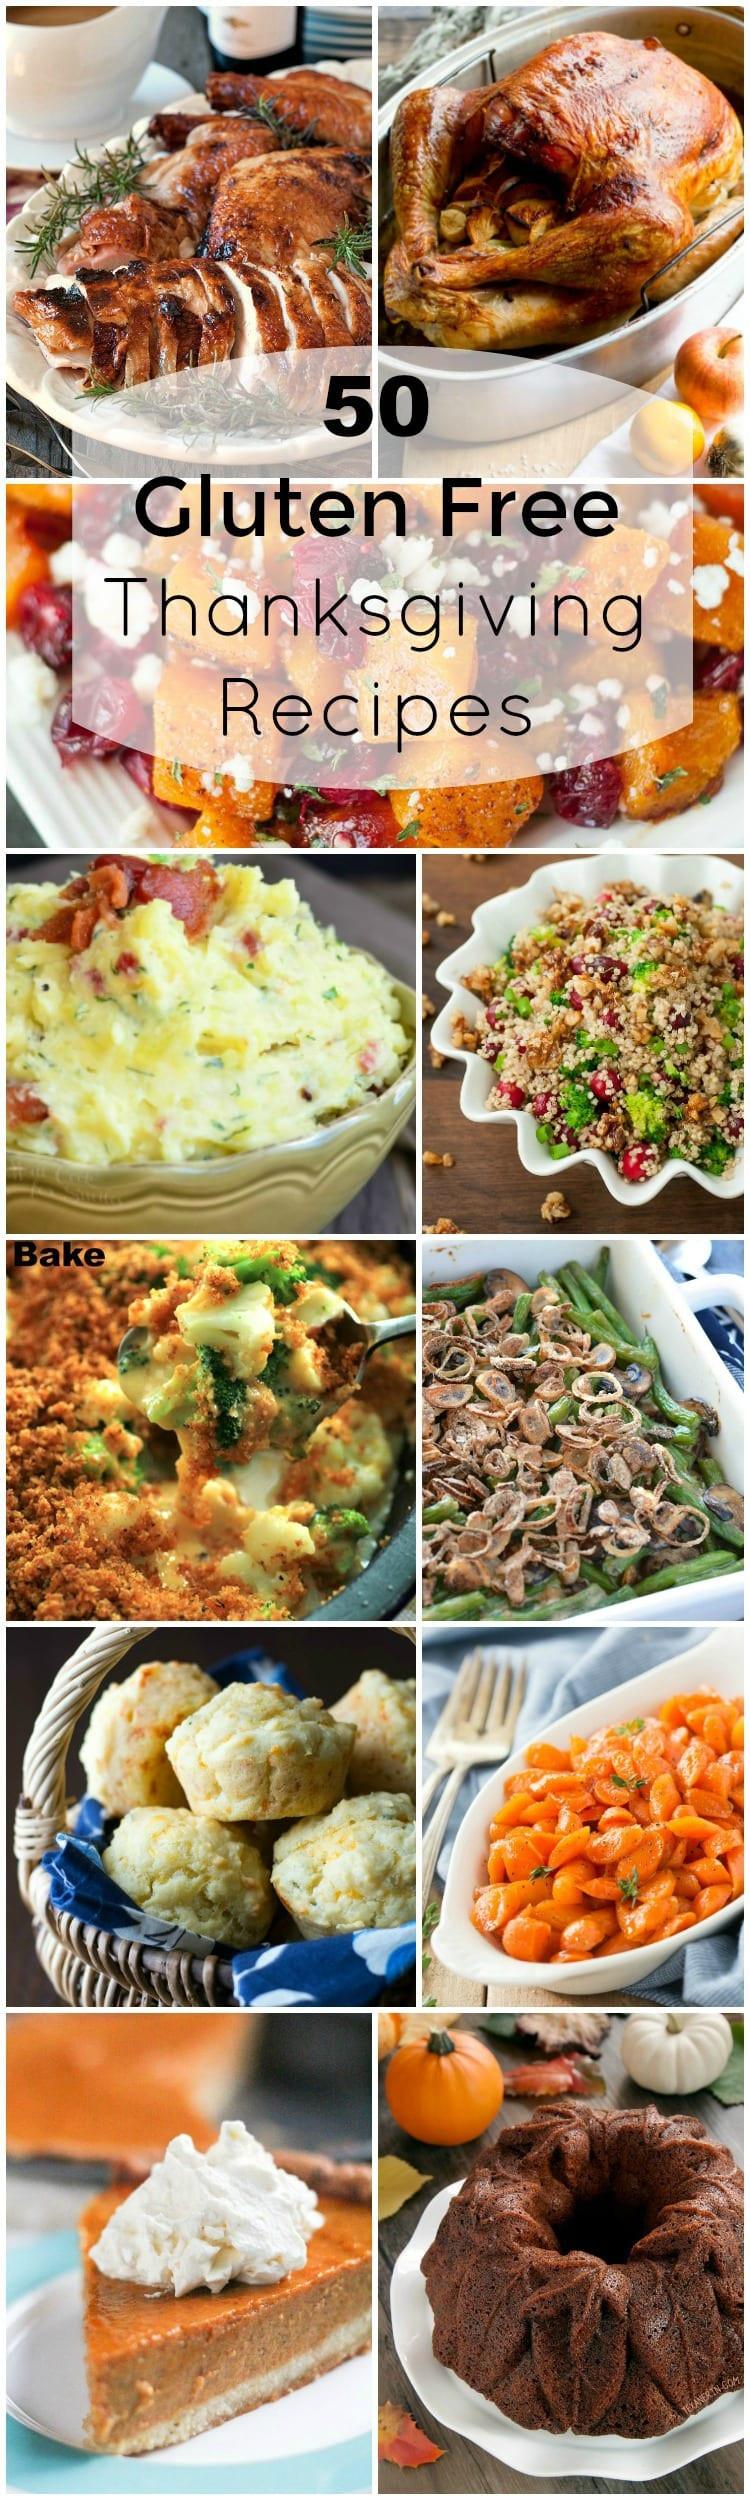 Gluten Free Thanksgiving Menu  50 Recipes For A plete Gluten Free Thanksgiving Dinner